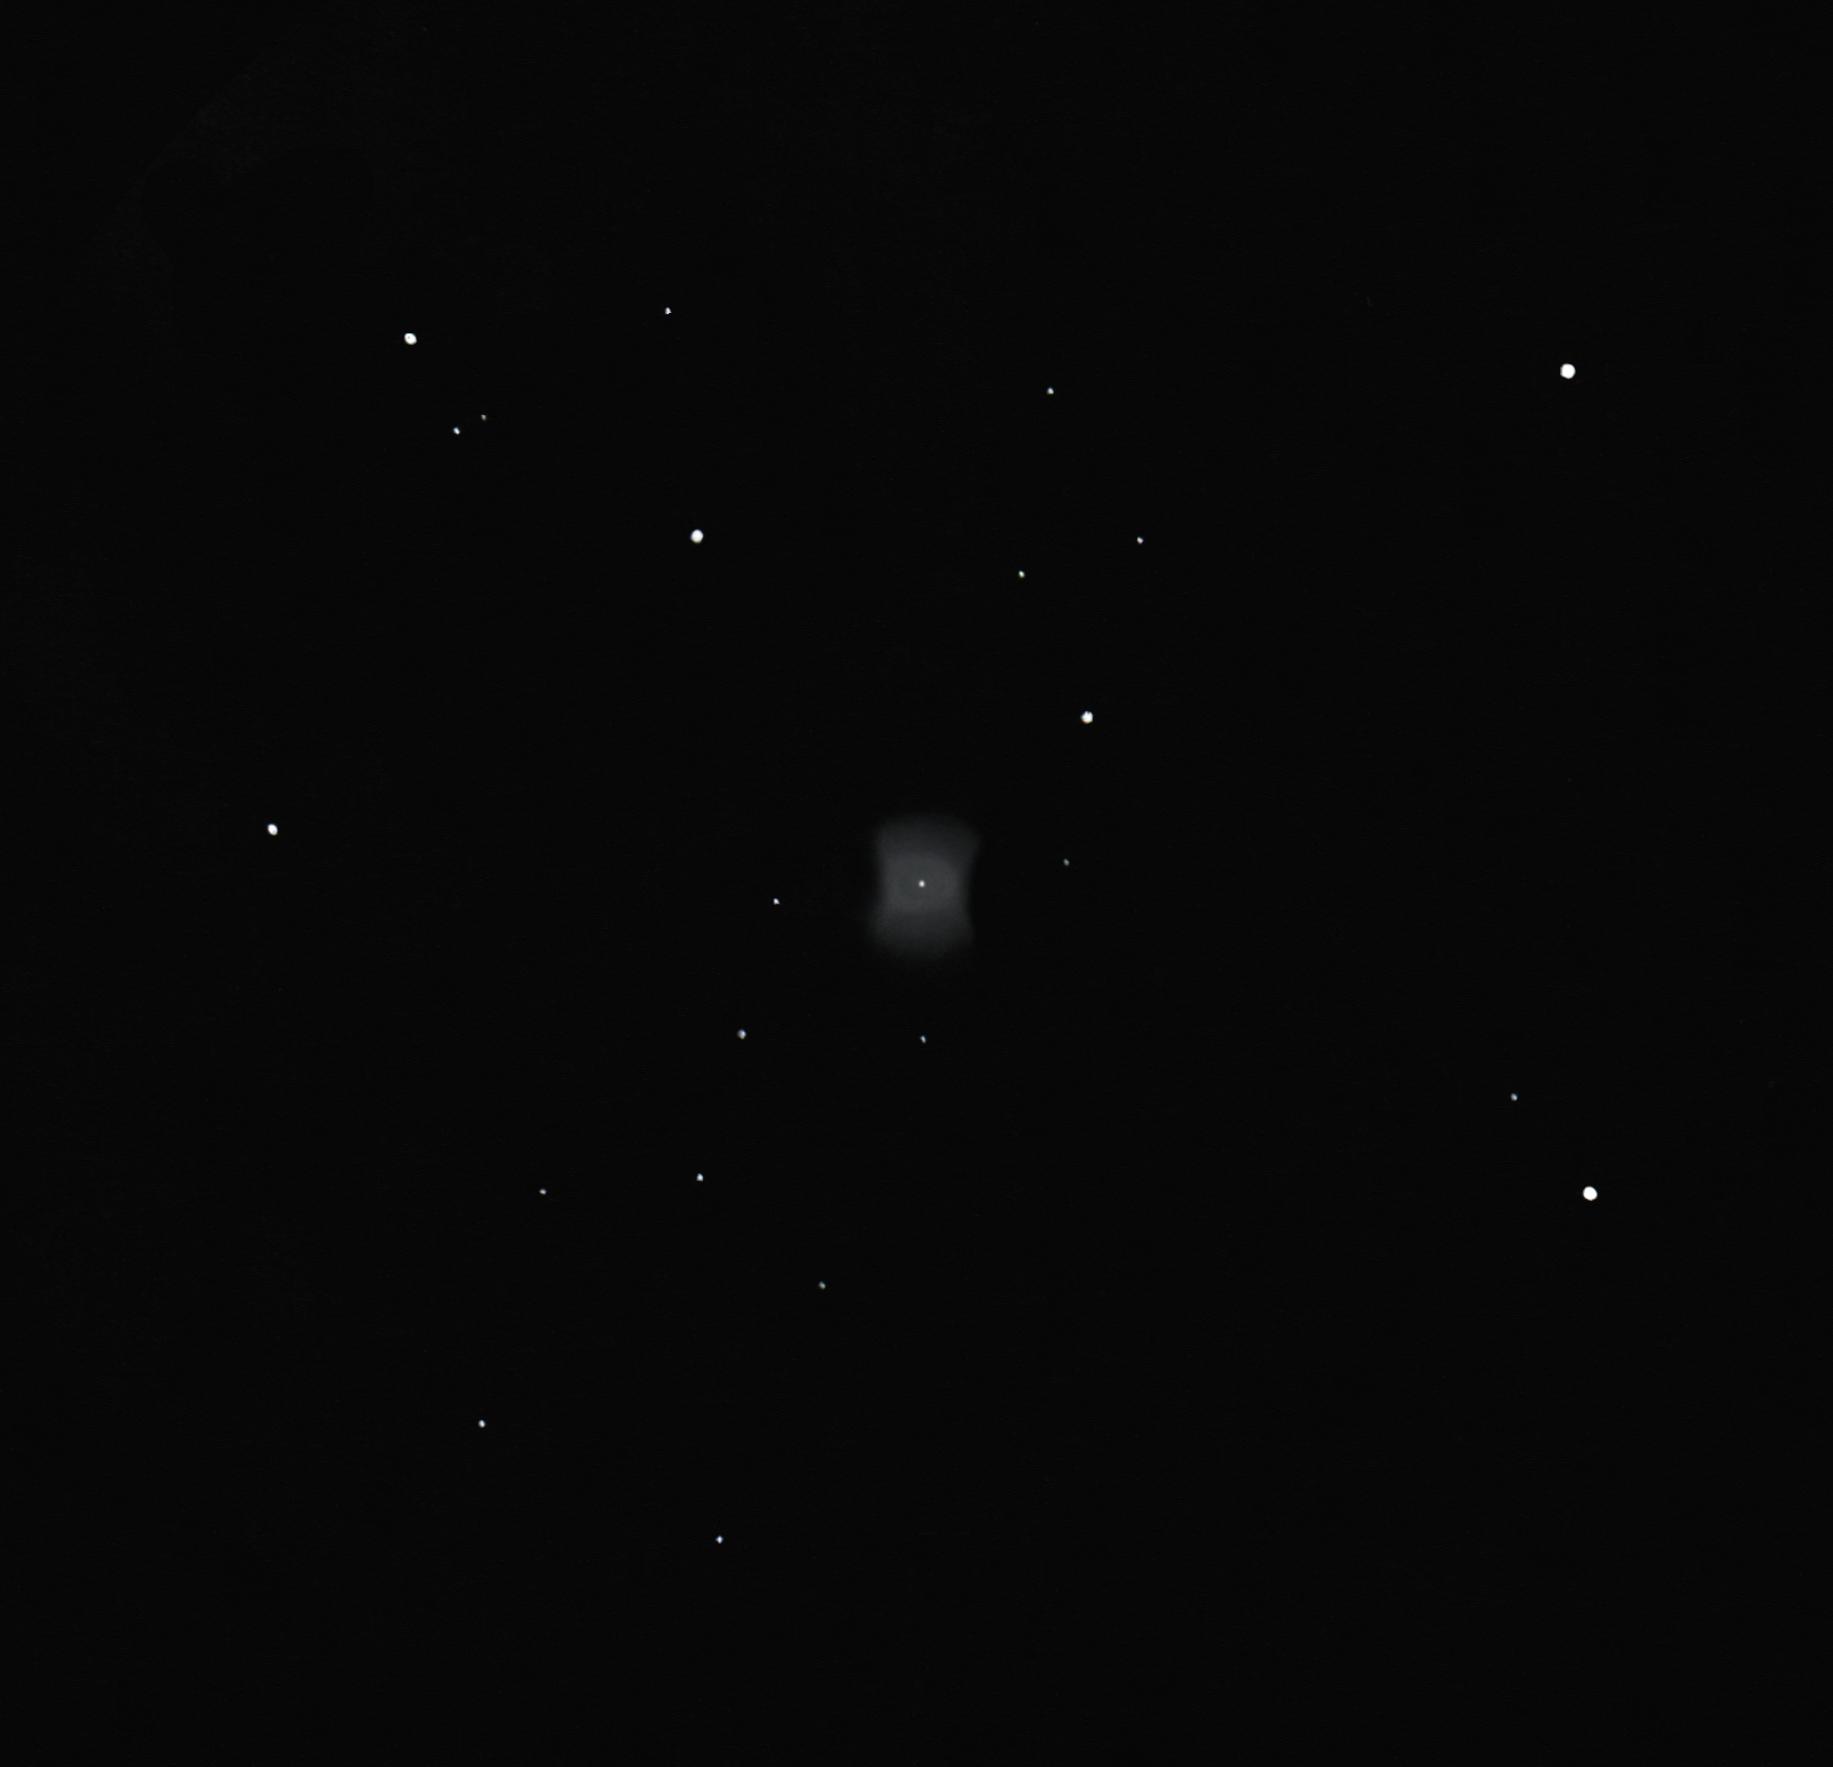 ngc 2346 planetary nebula